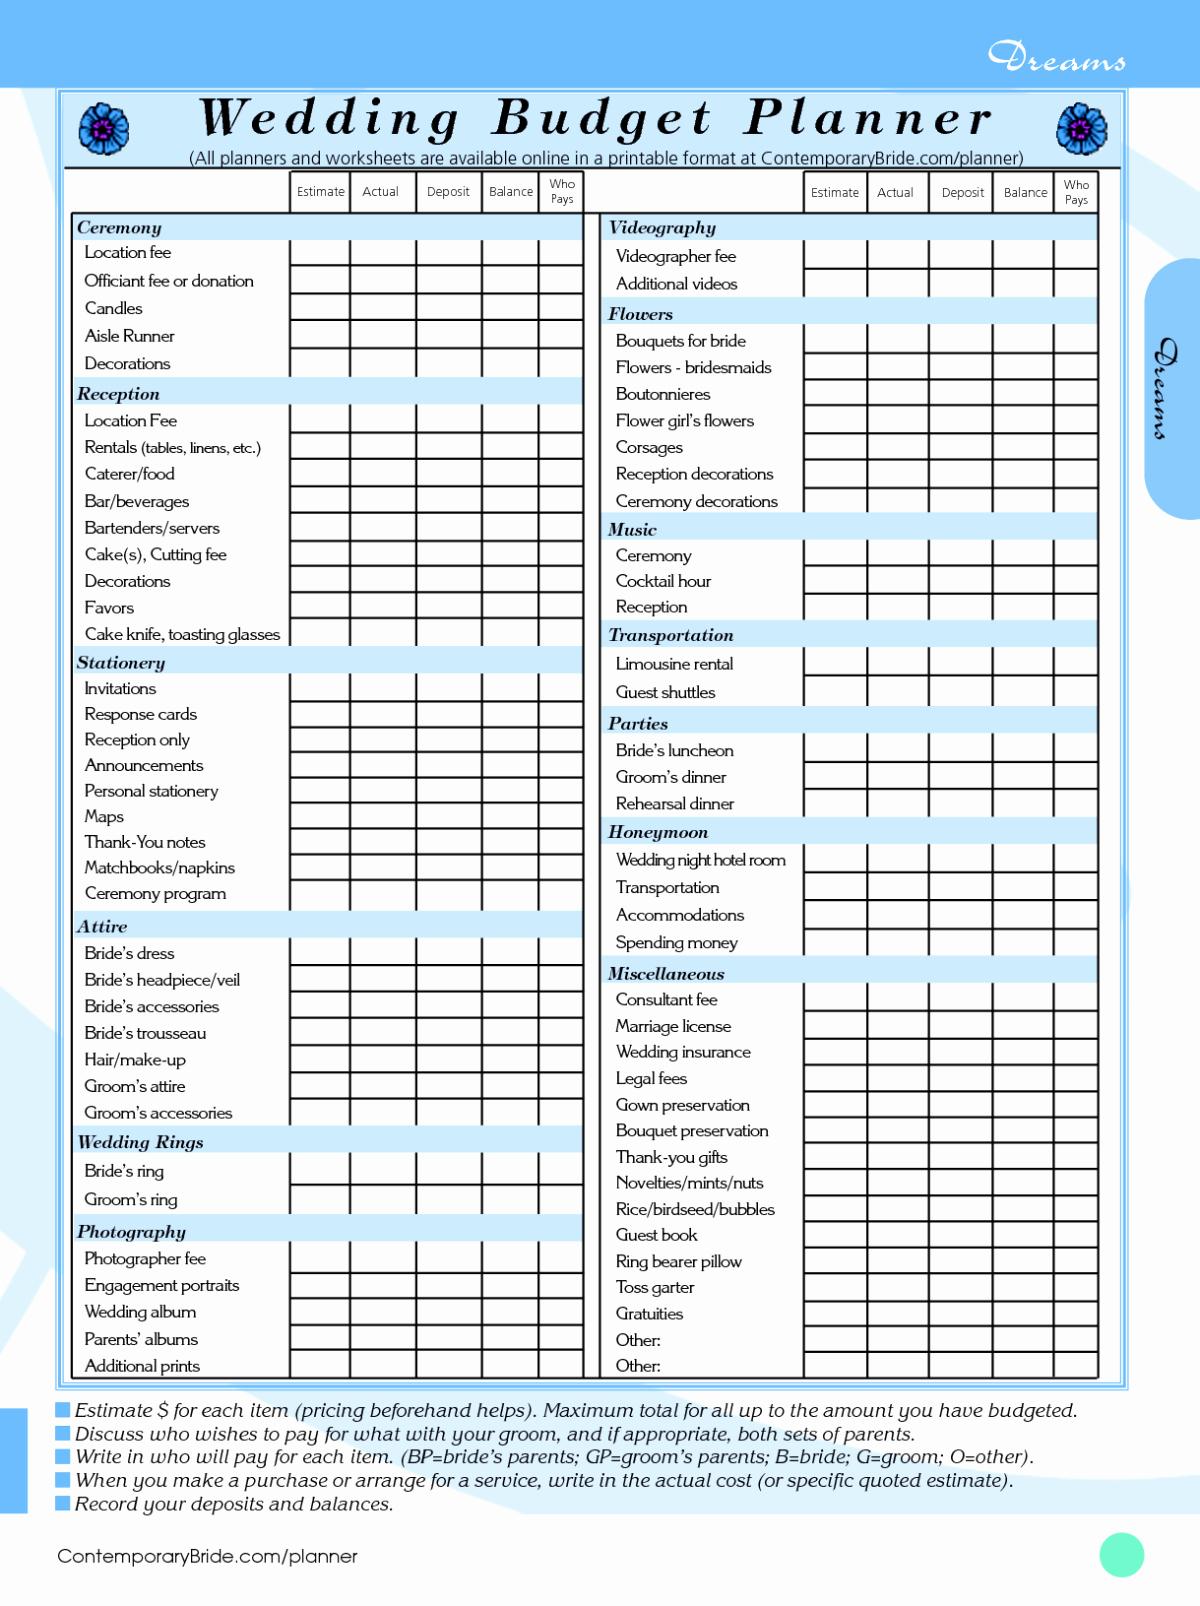 Wedding Budget Planner Template Elegant Wedding Bud Spreadsheet Template Driverlayer Search